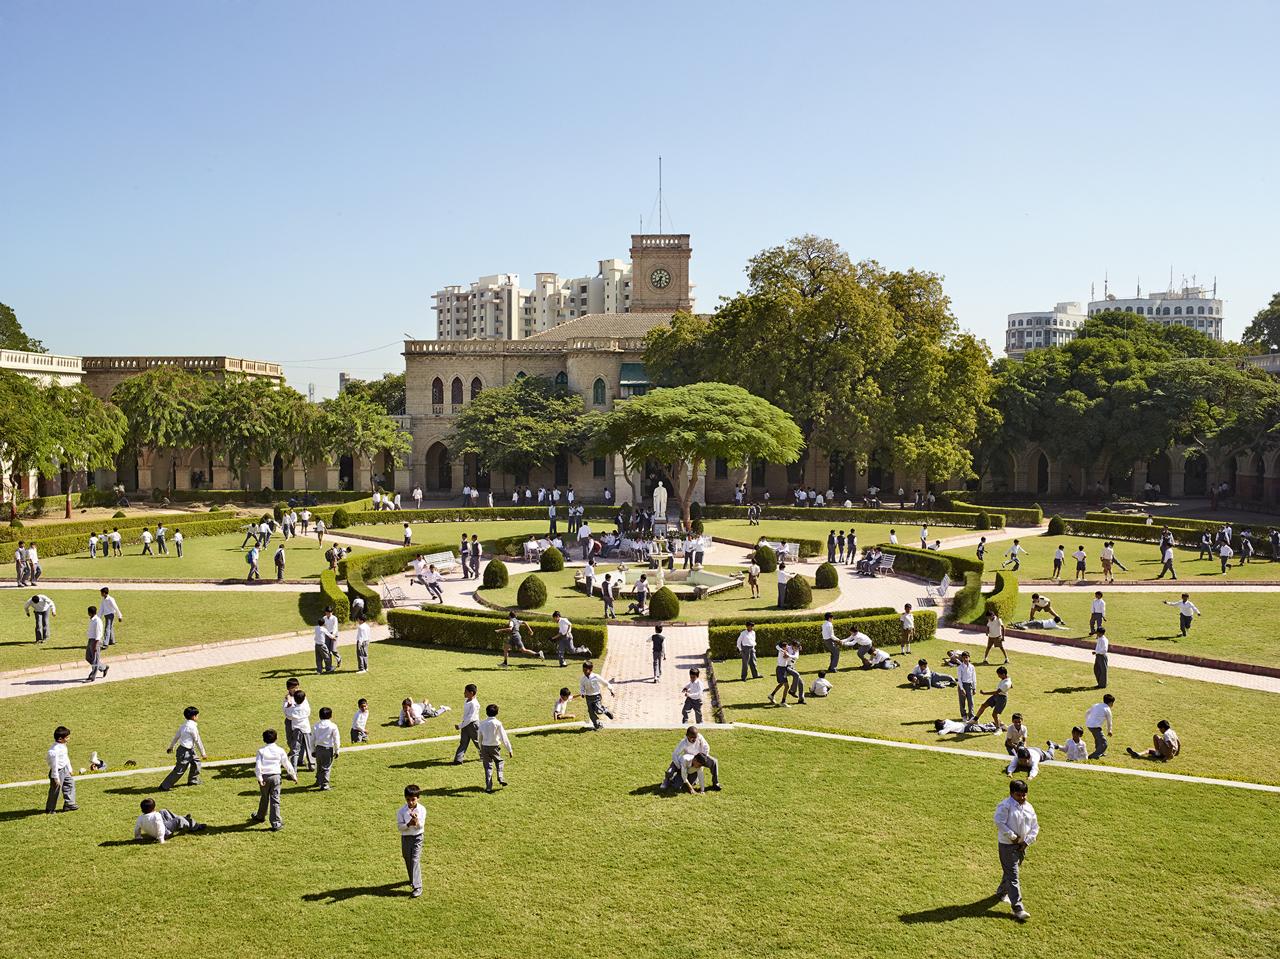 JAMES MOLLISON Rajkumar College, Rajkot, Gujarat, India, November 28, 2012